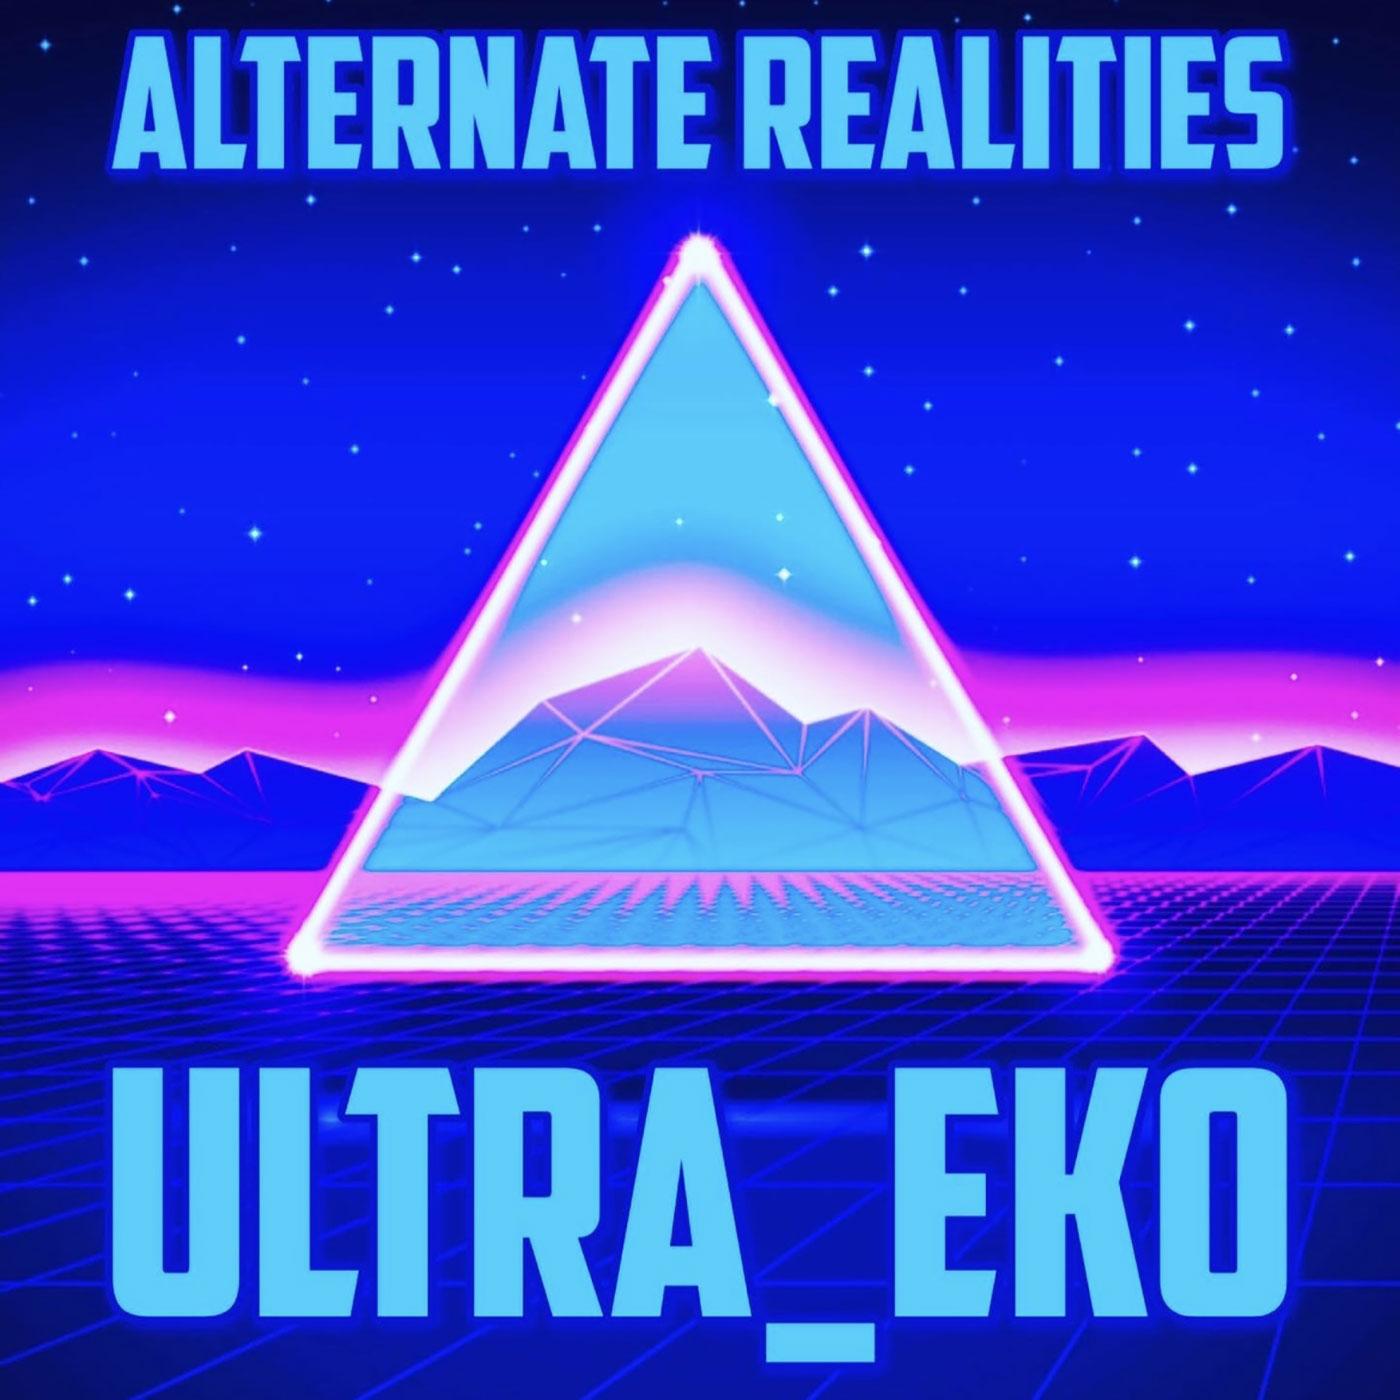 Ultra_Eko - Alternate Realities